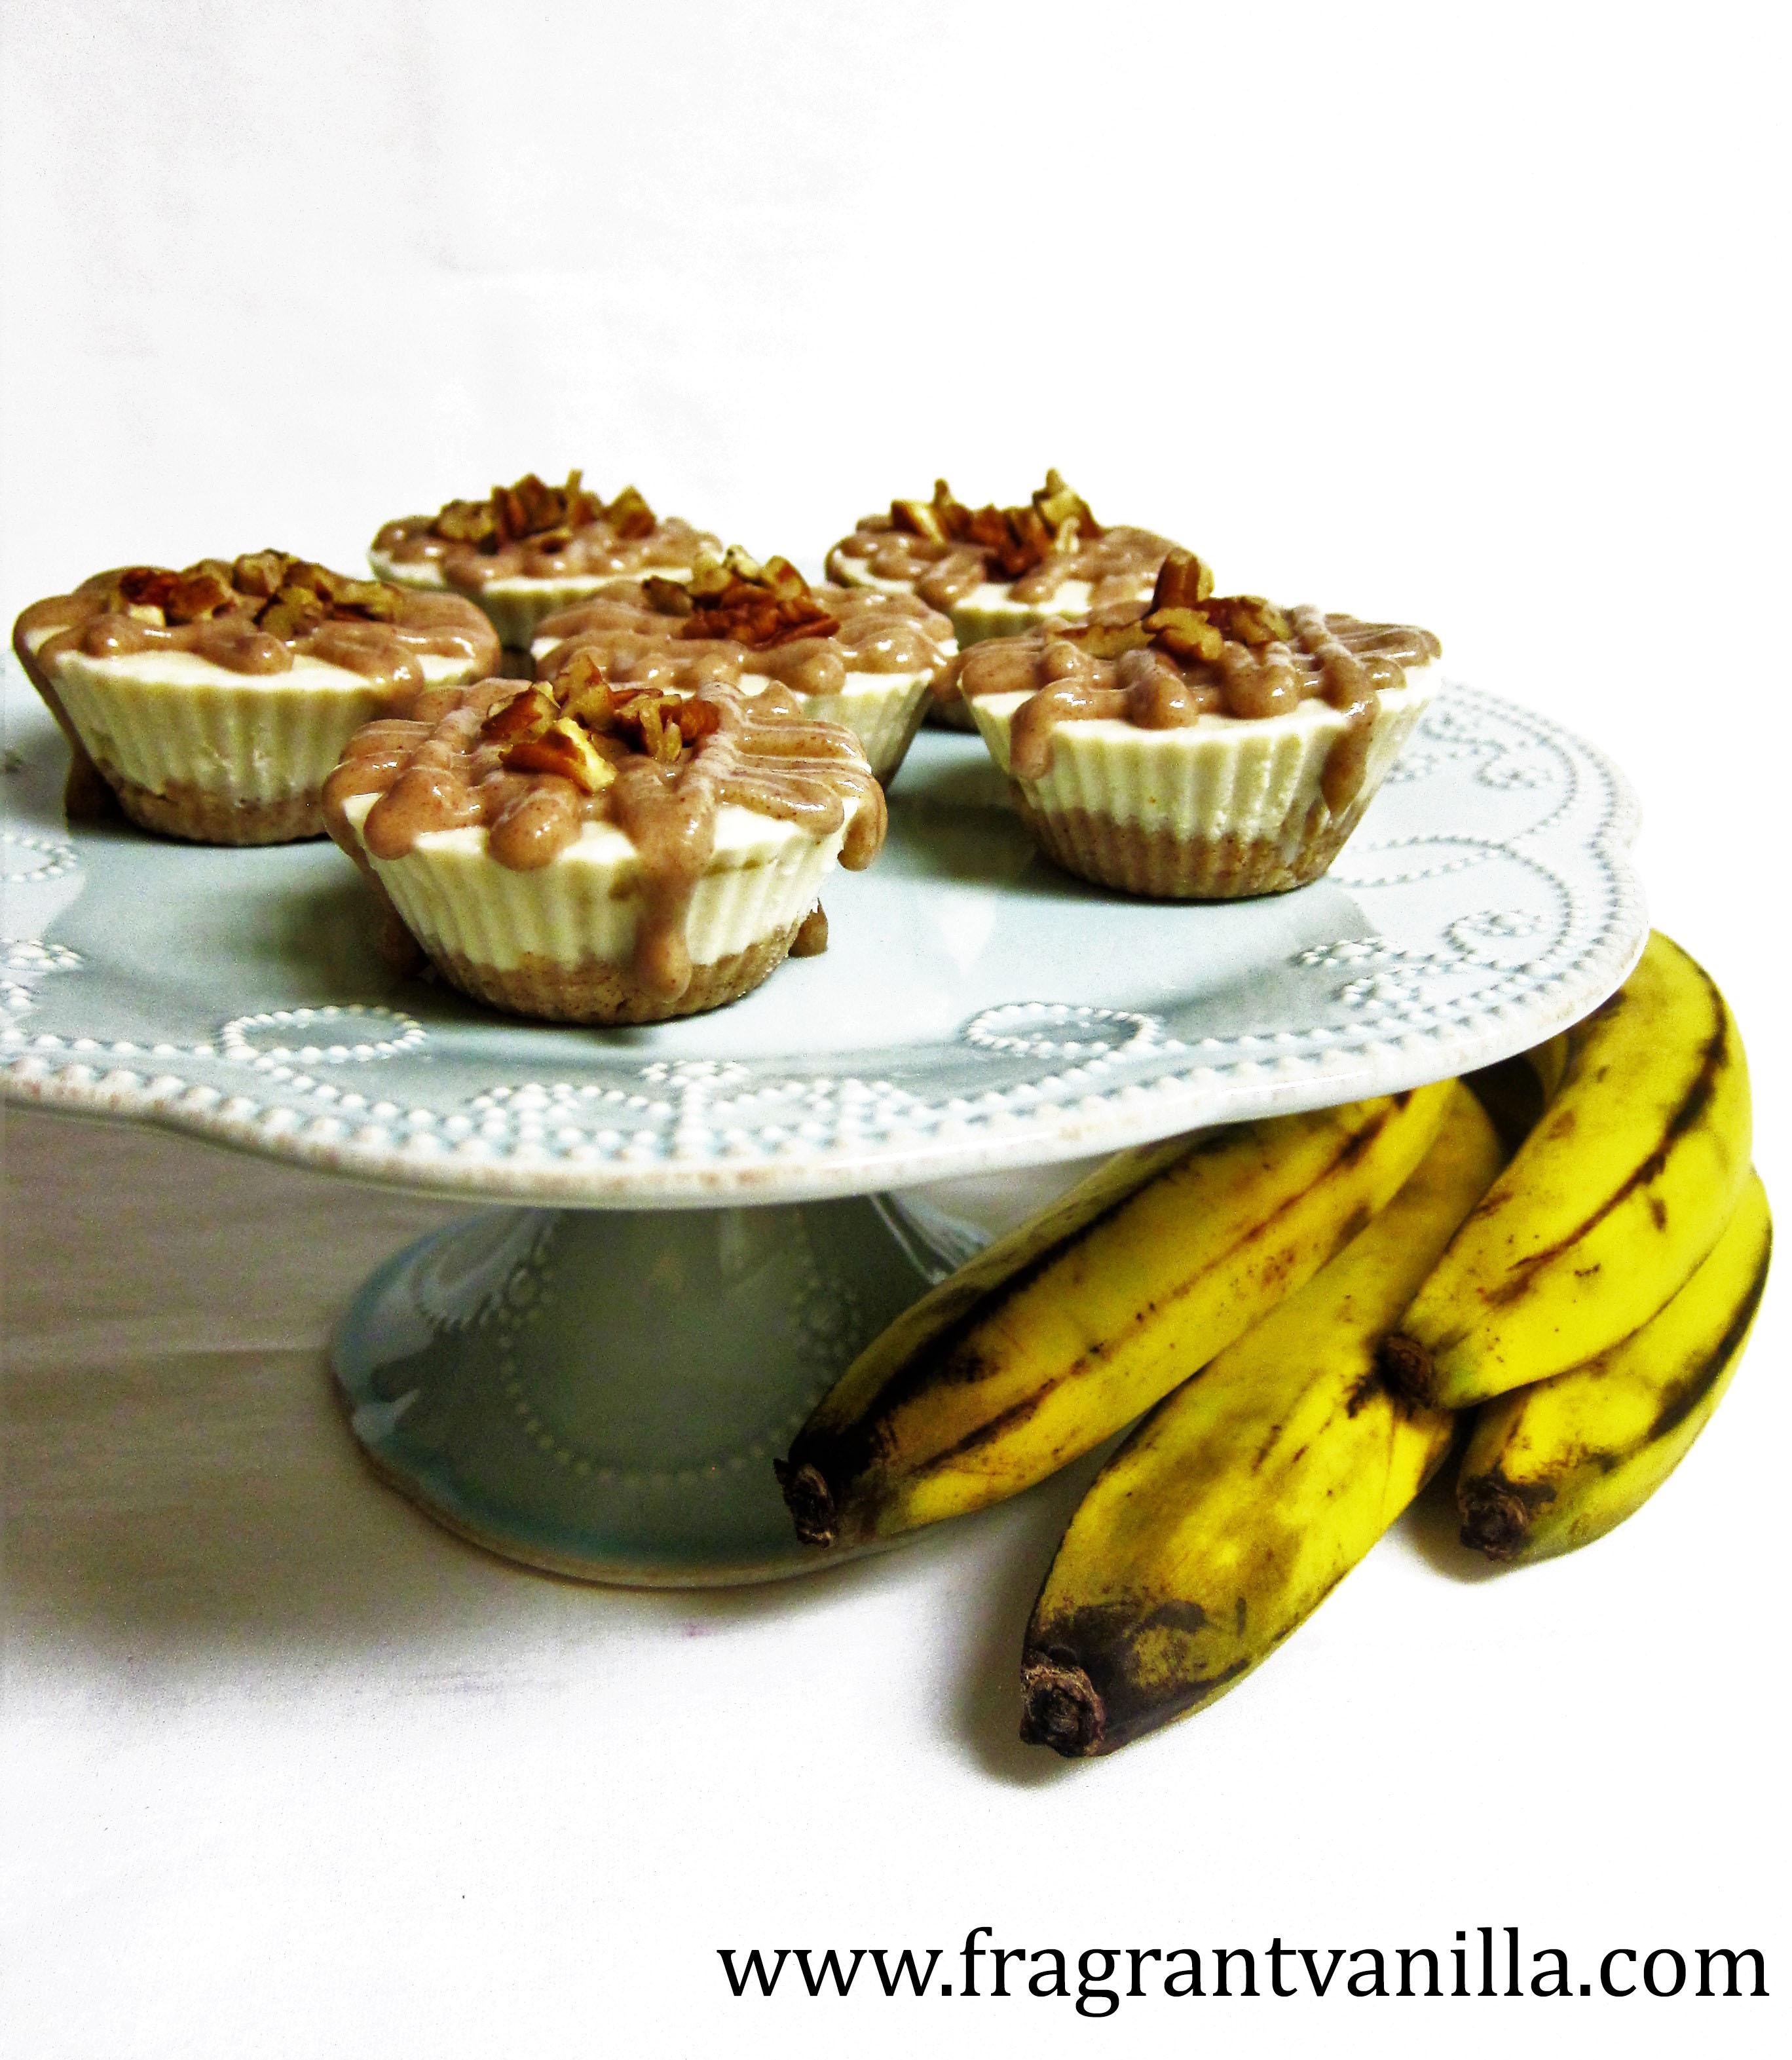 Vegan Mini Caramel Pecan Banana Cream Cheesecakes